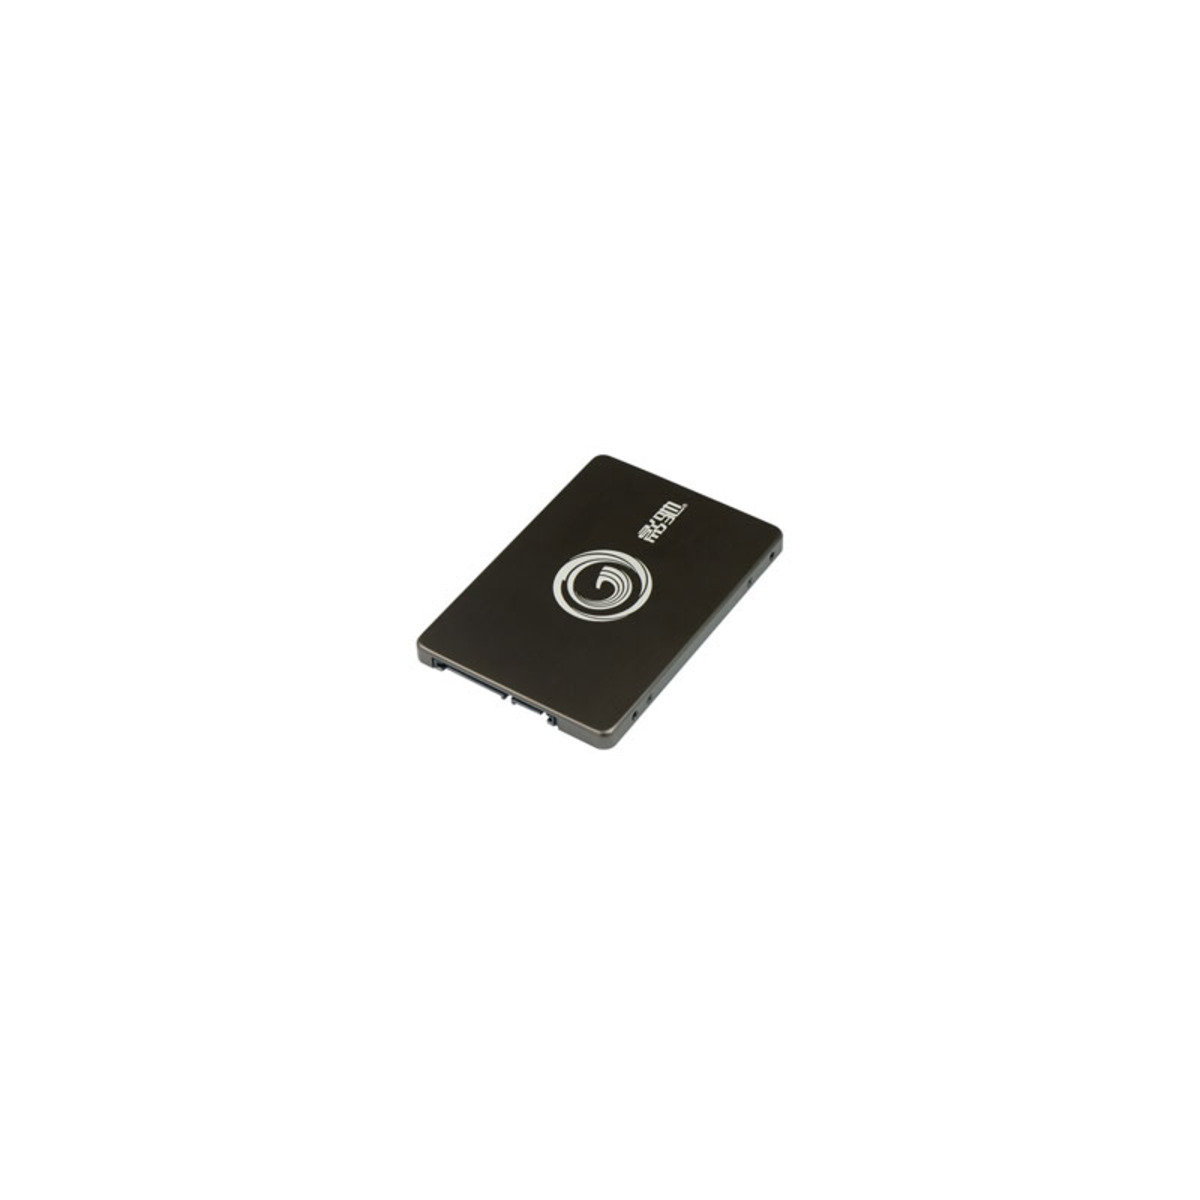 SSD 高速內置固態硬碟 鐵甲戰將 240GB